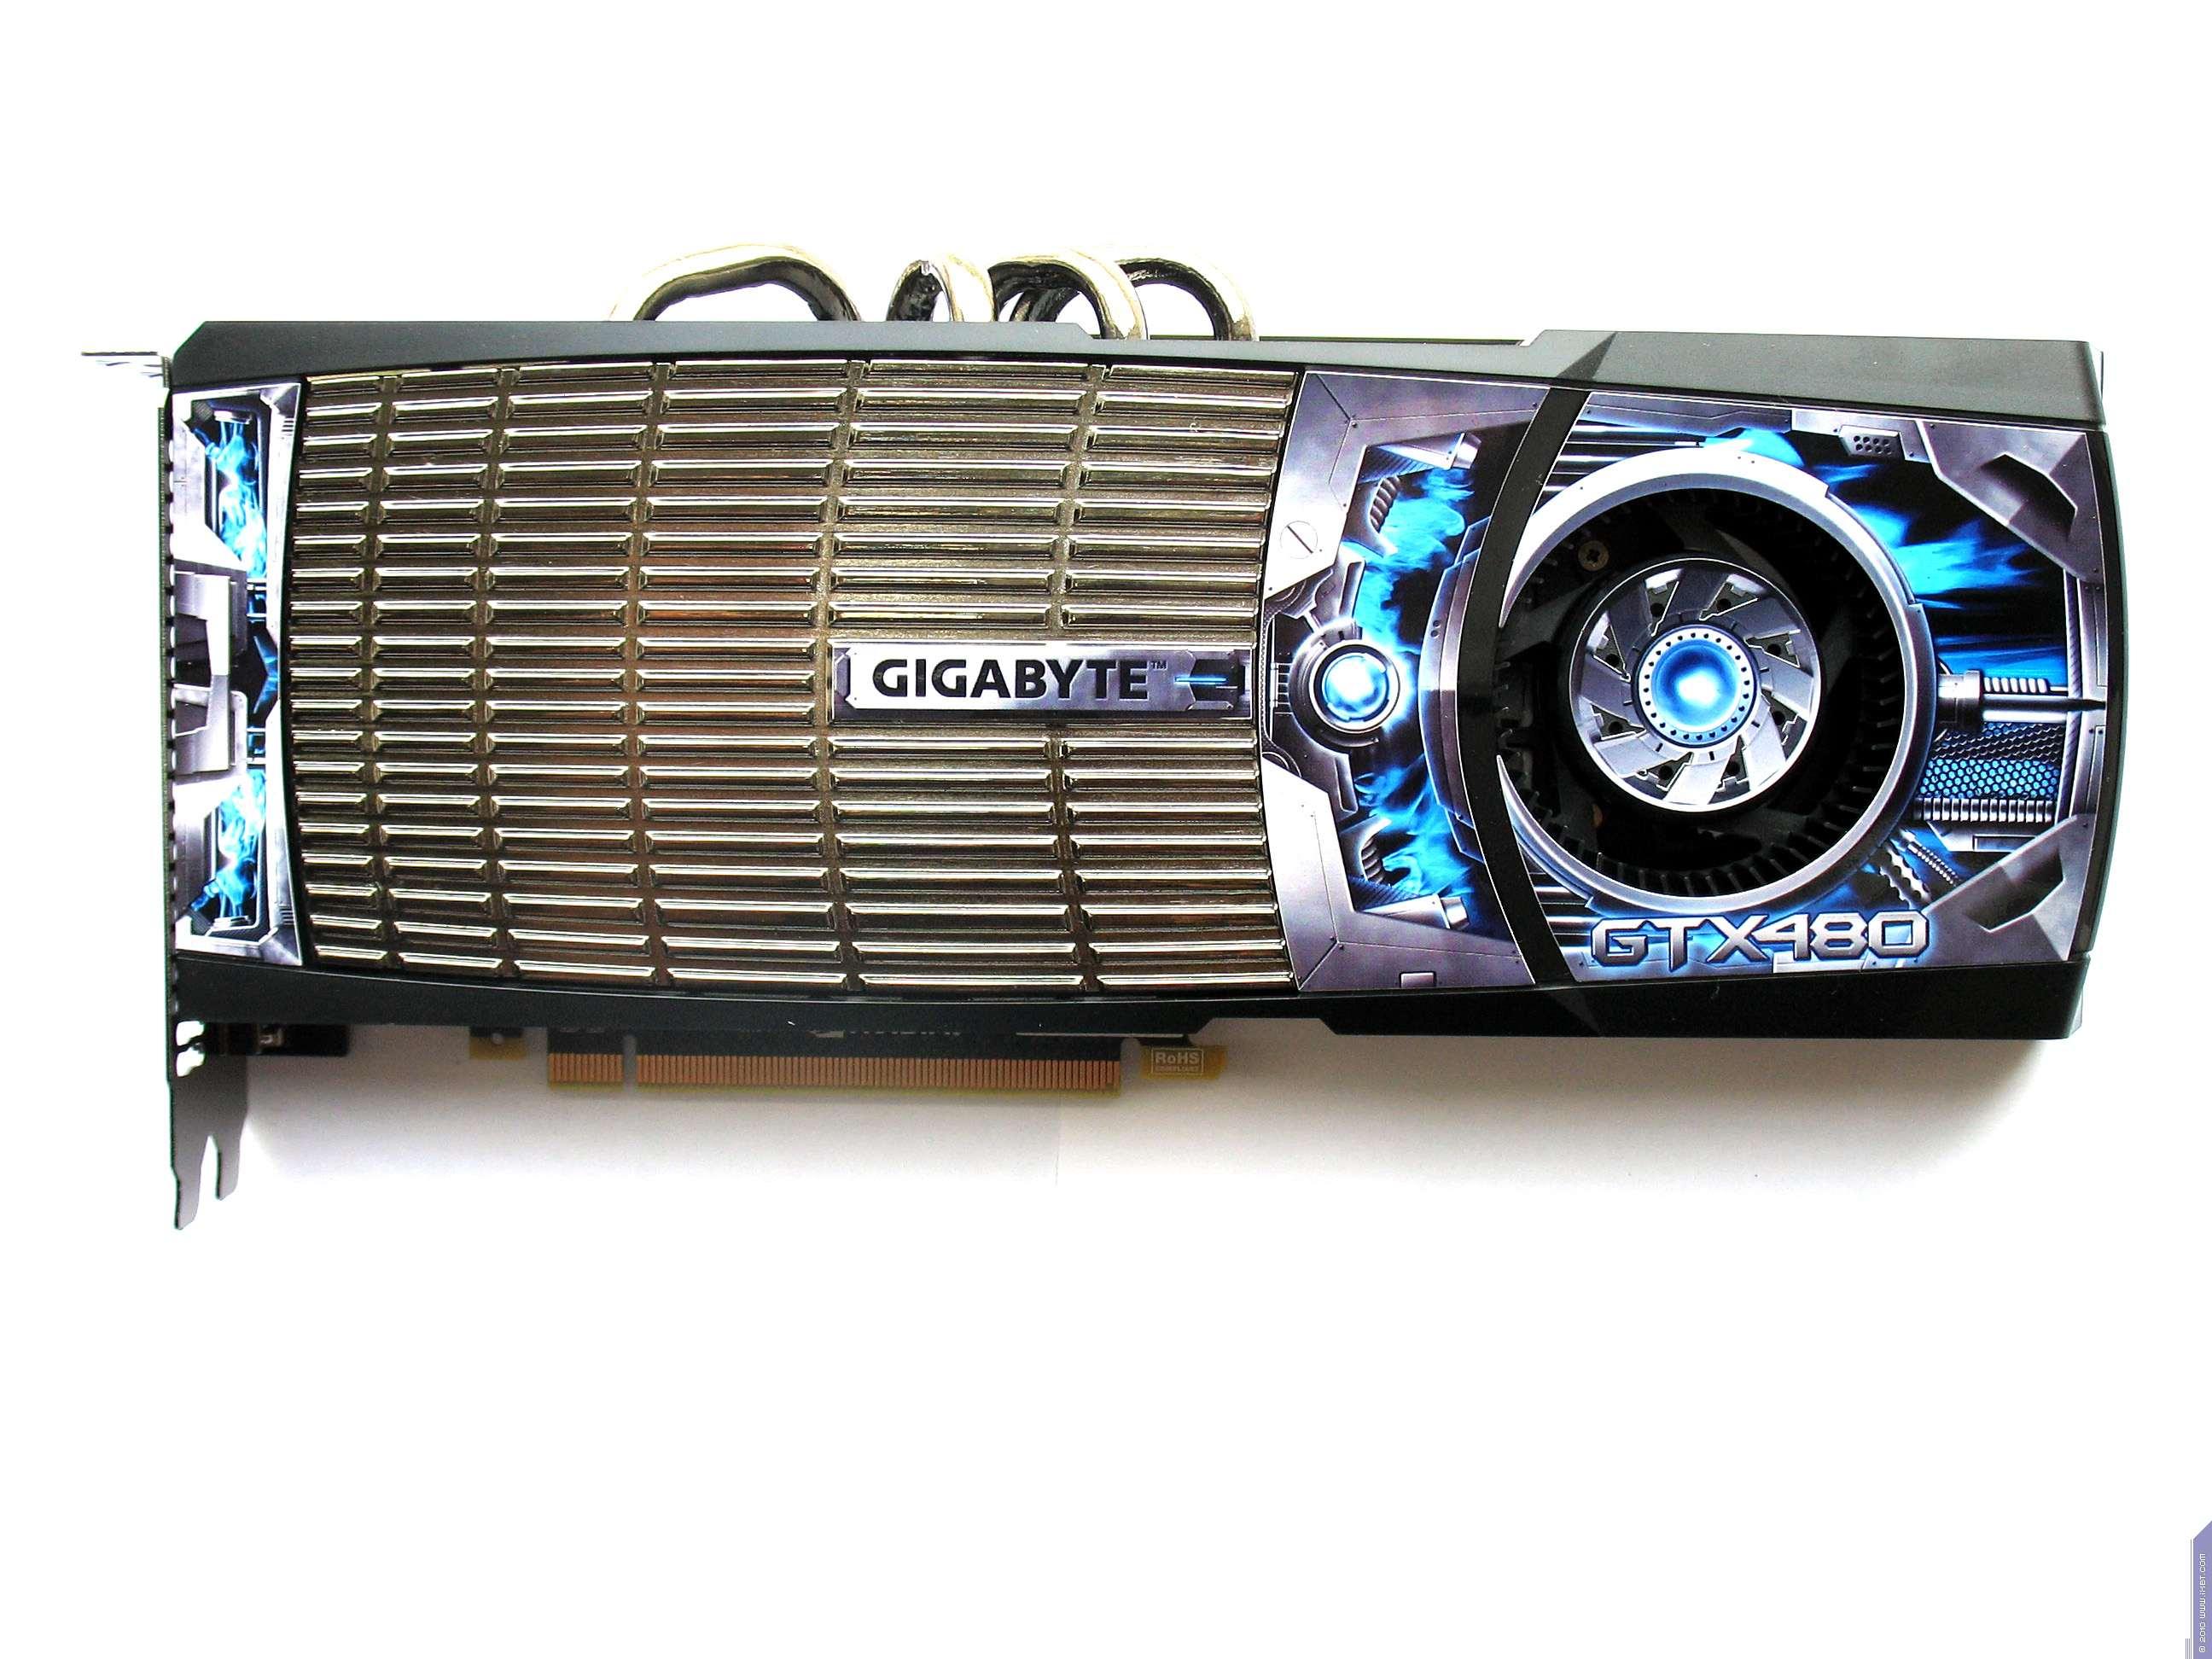 Gigabyte GeForce GTX 1650 OC Entry GPU Review | ServeTheHome